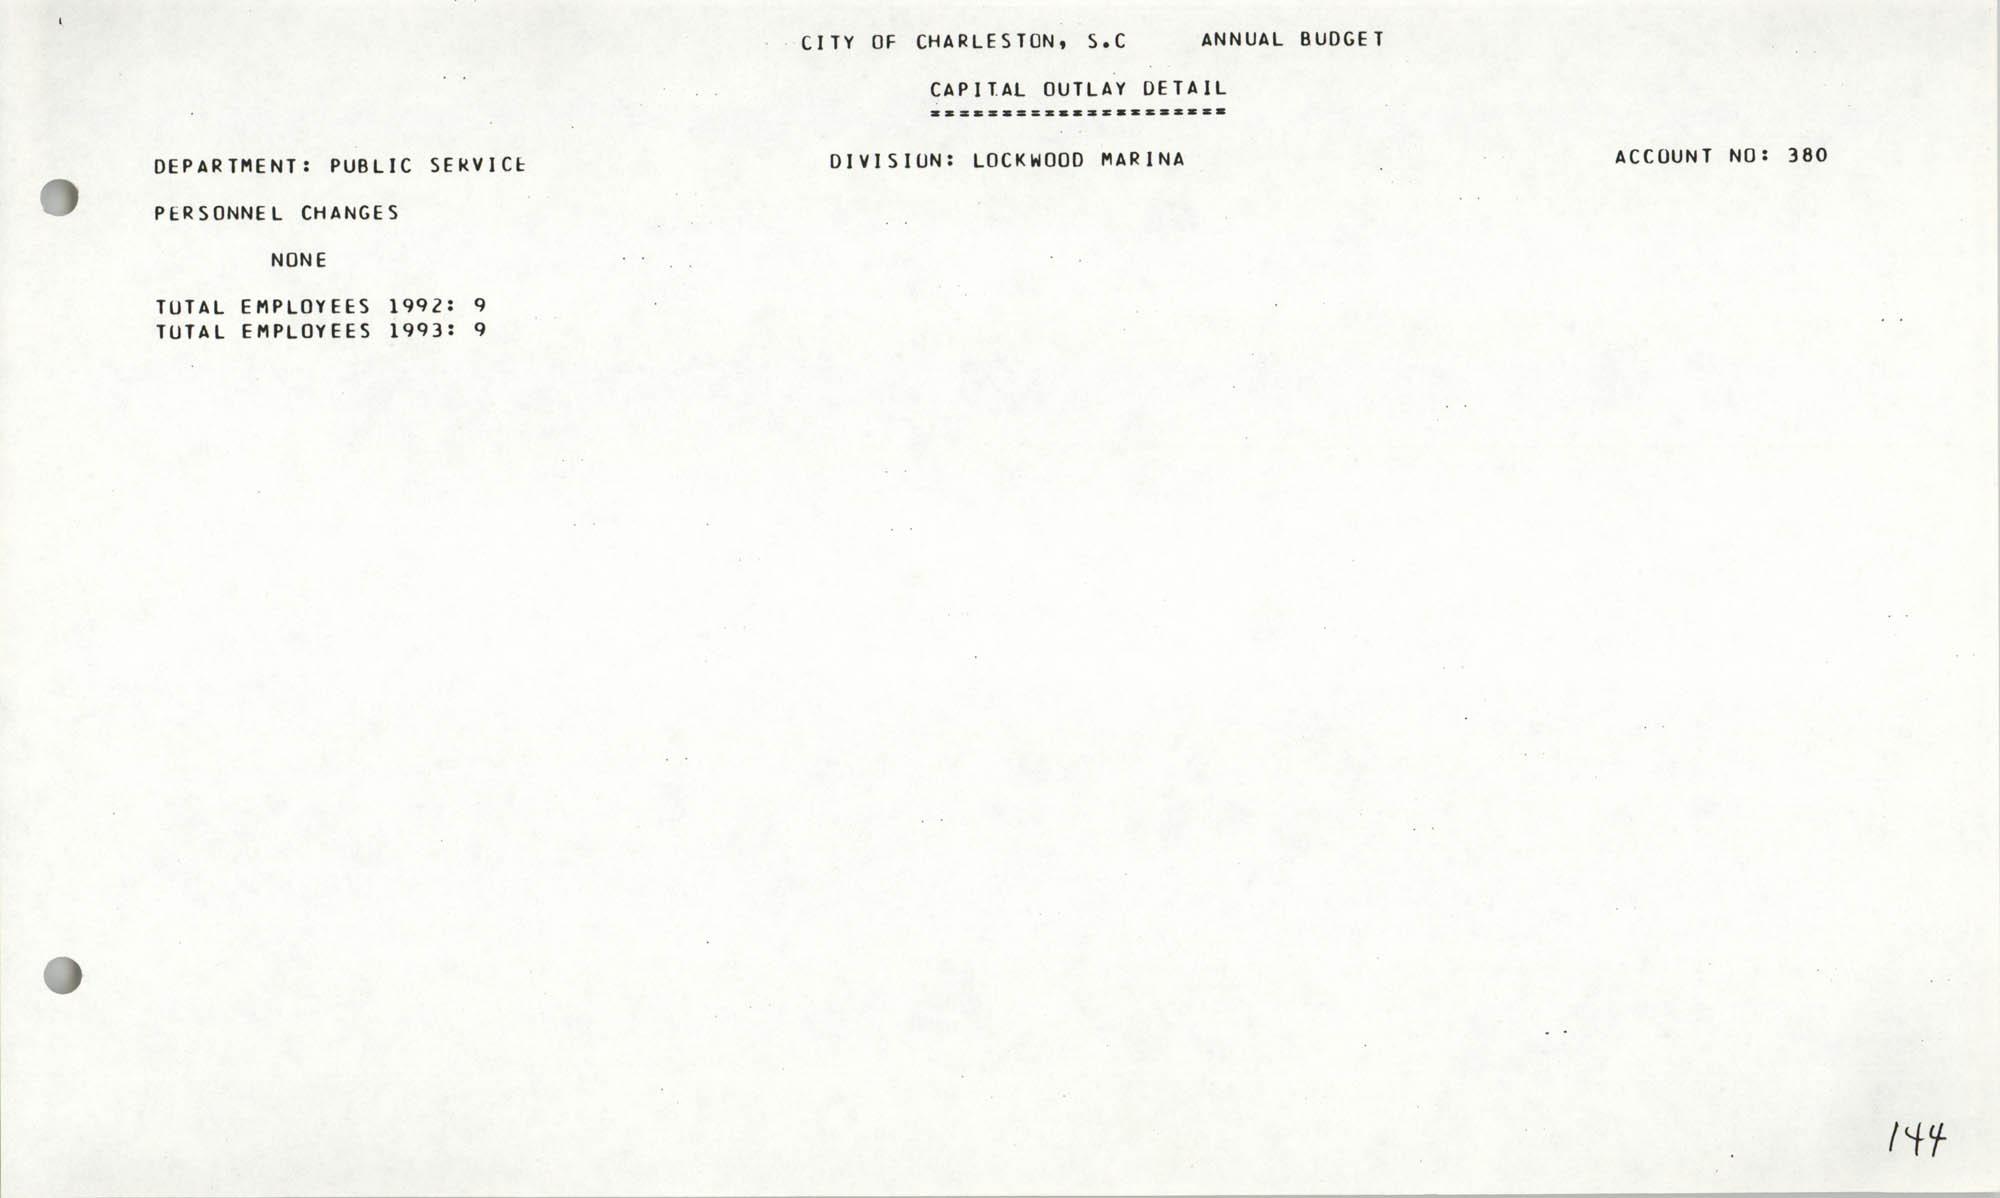 The City Council of Charleston, South Carolina, 1993 Budget, Page 144